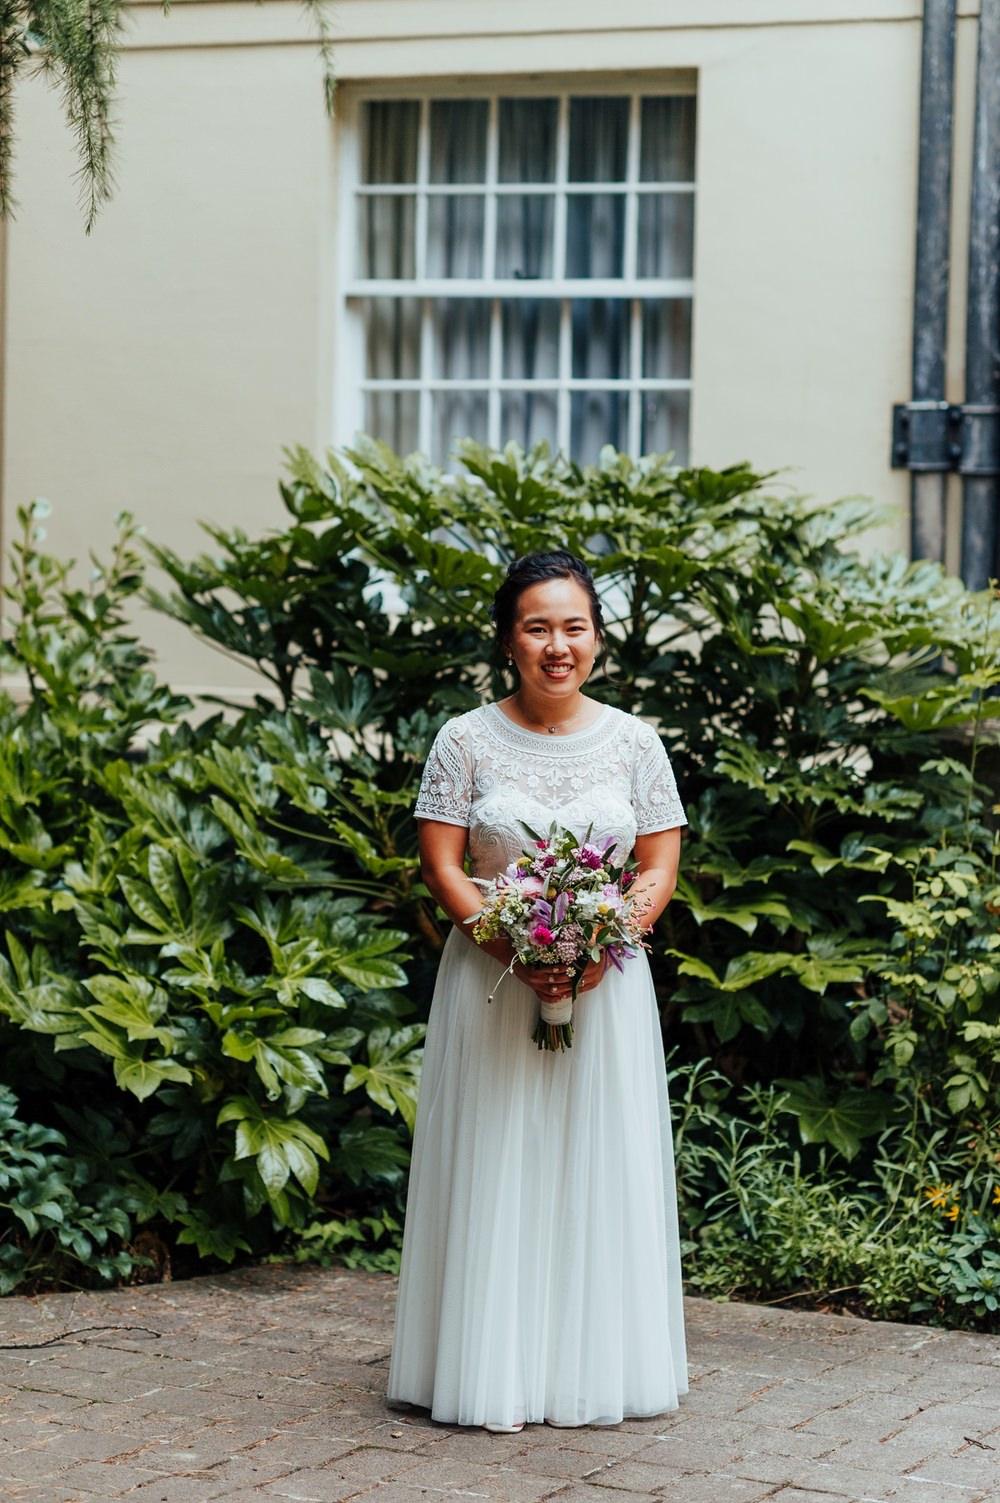 Monsoon Dress Gown Bride Bridal July 2020 Wedding Nathan Walker Photography